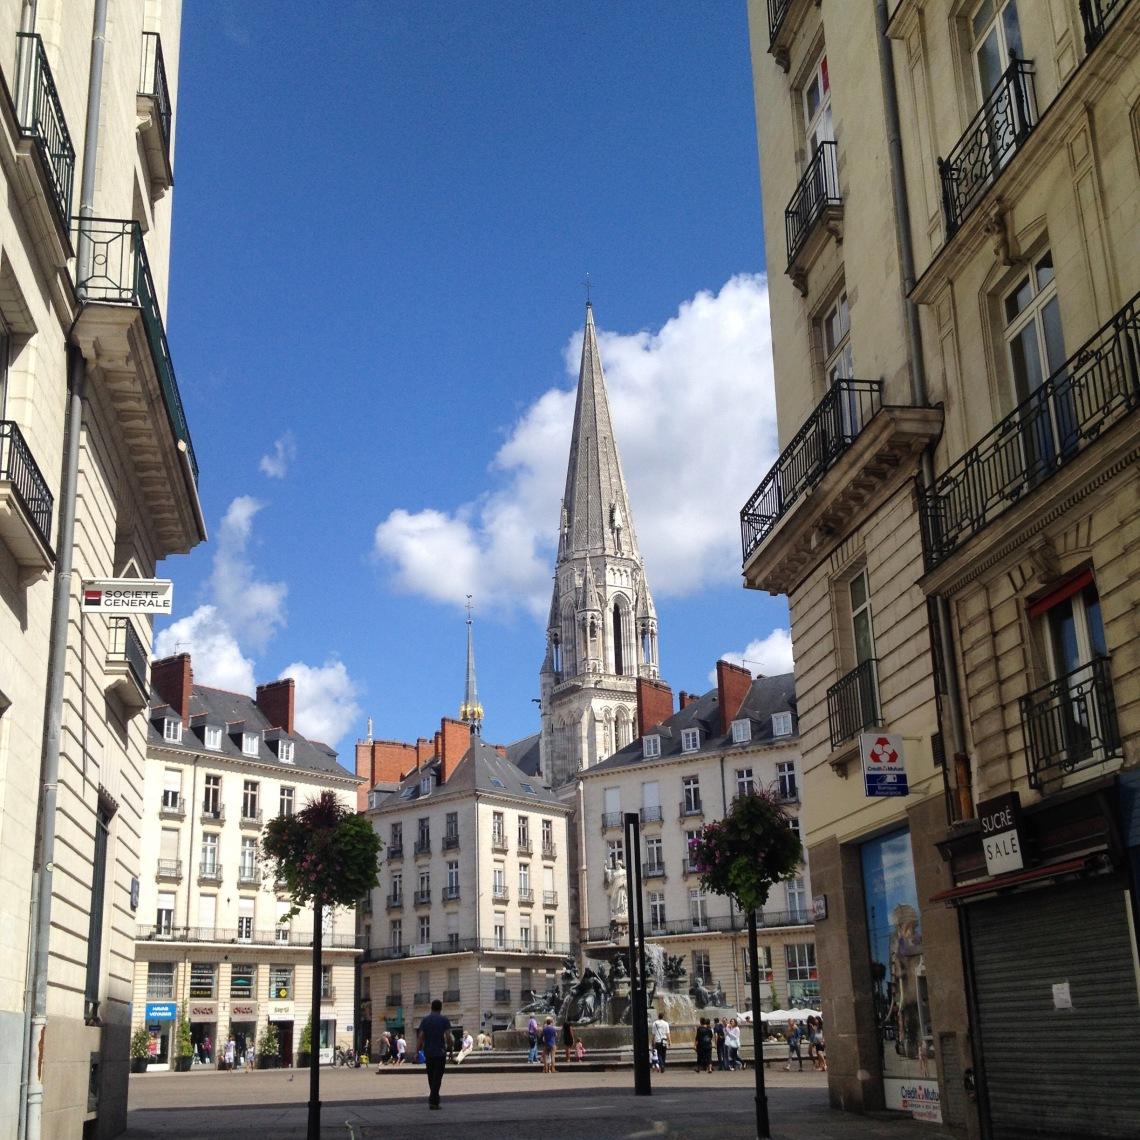 NantestownSquare2014